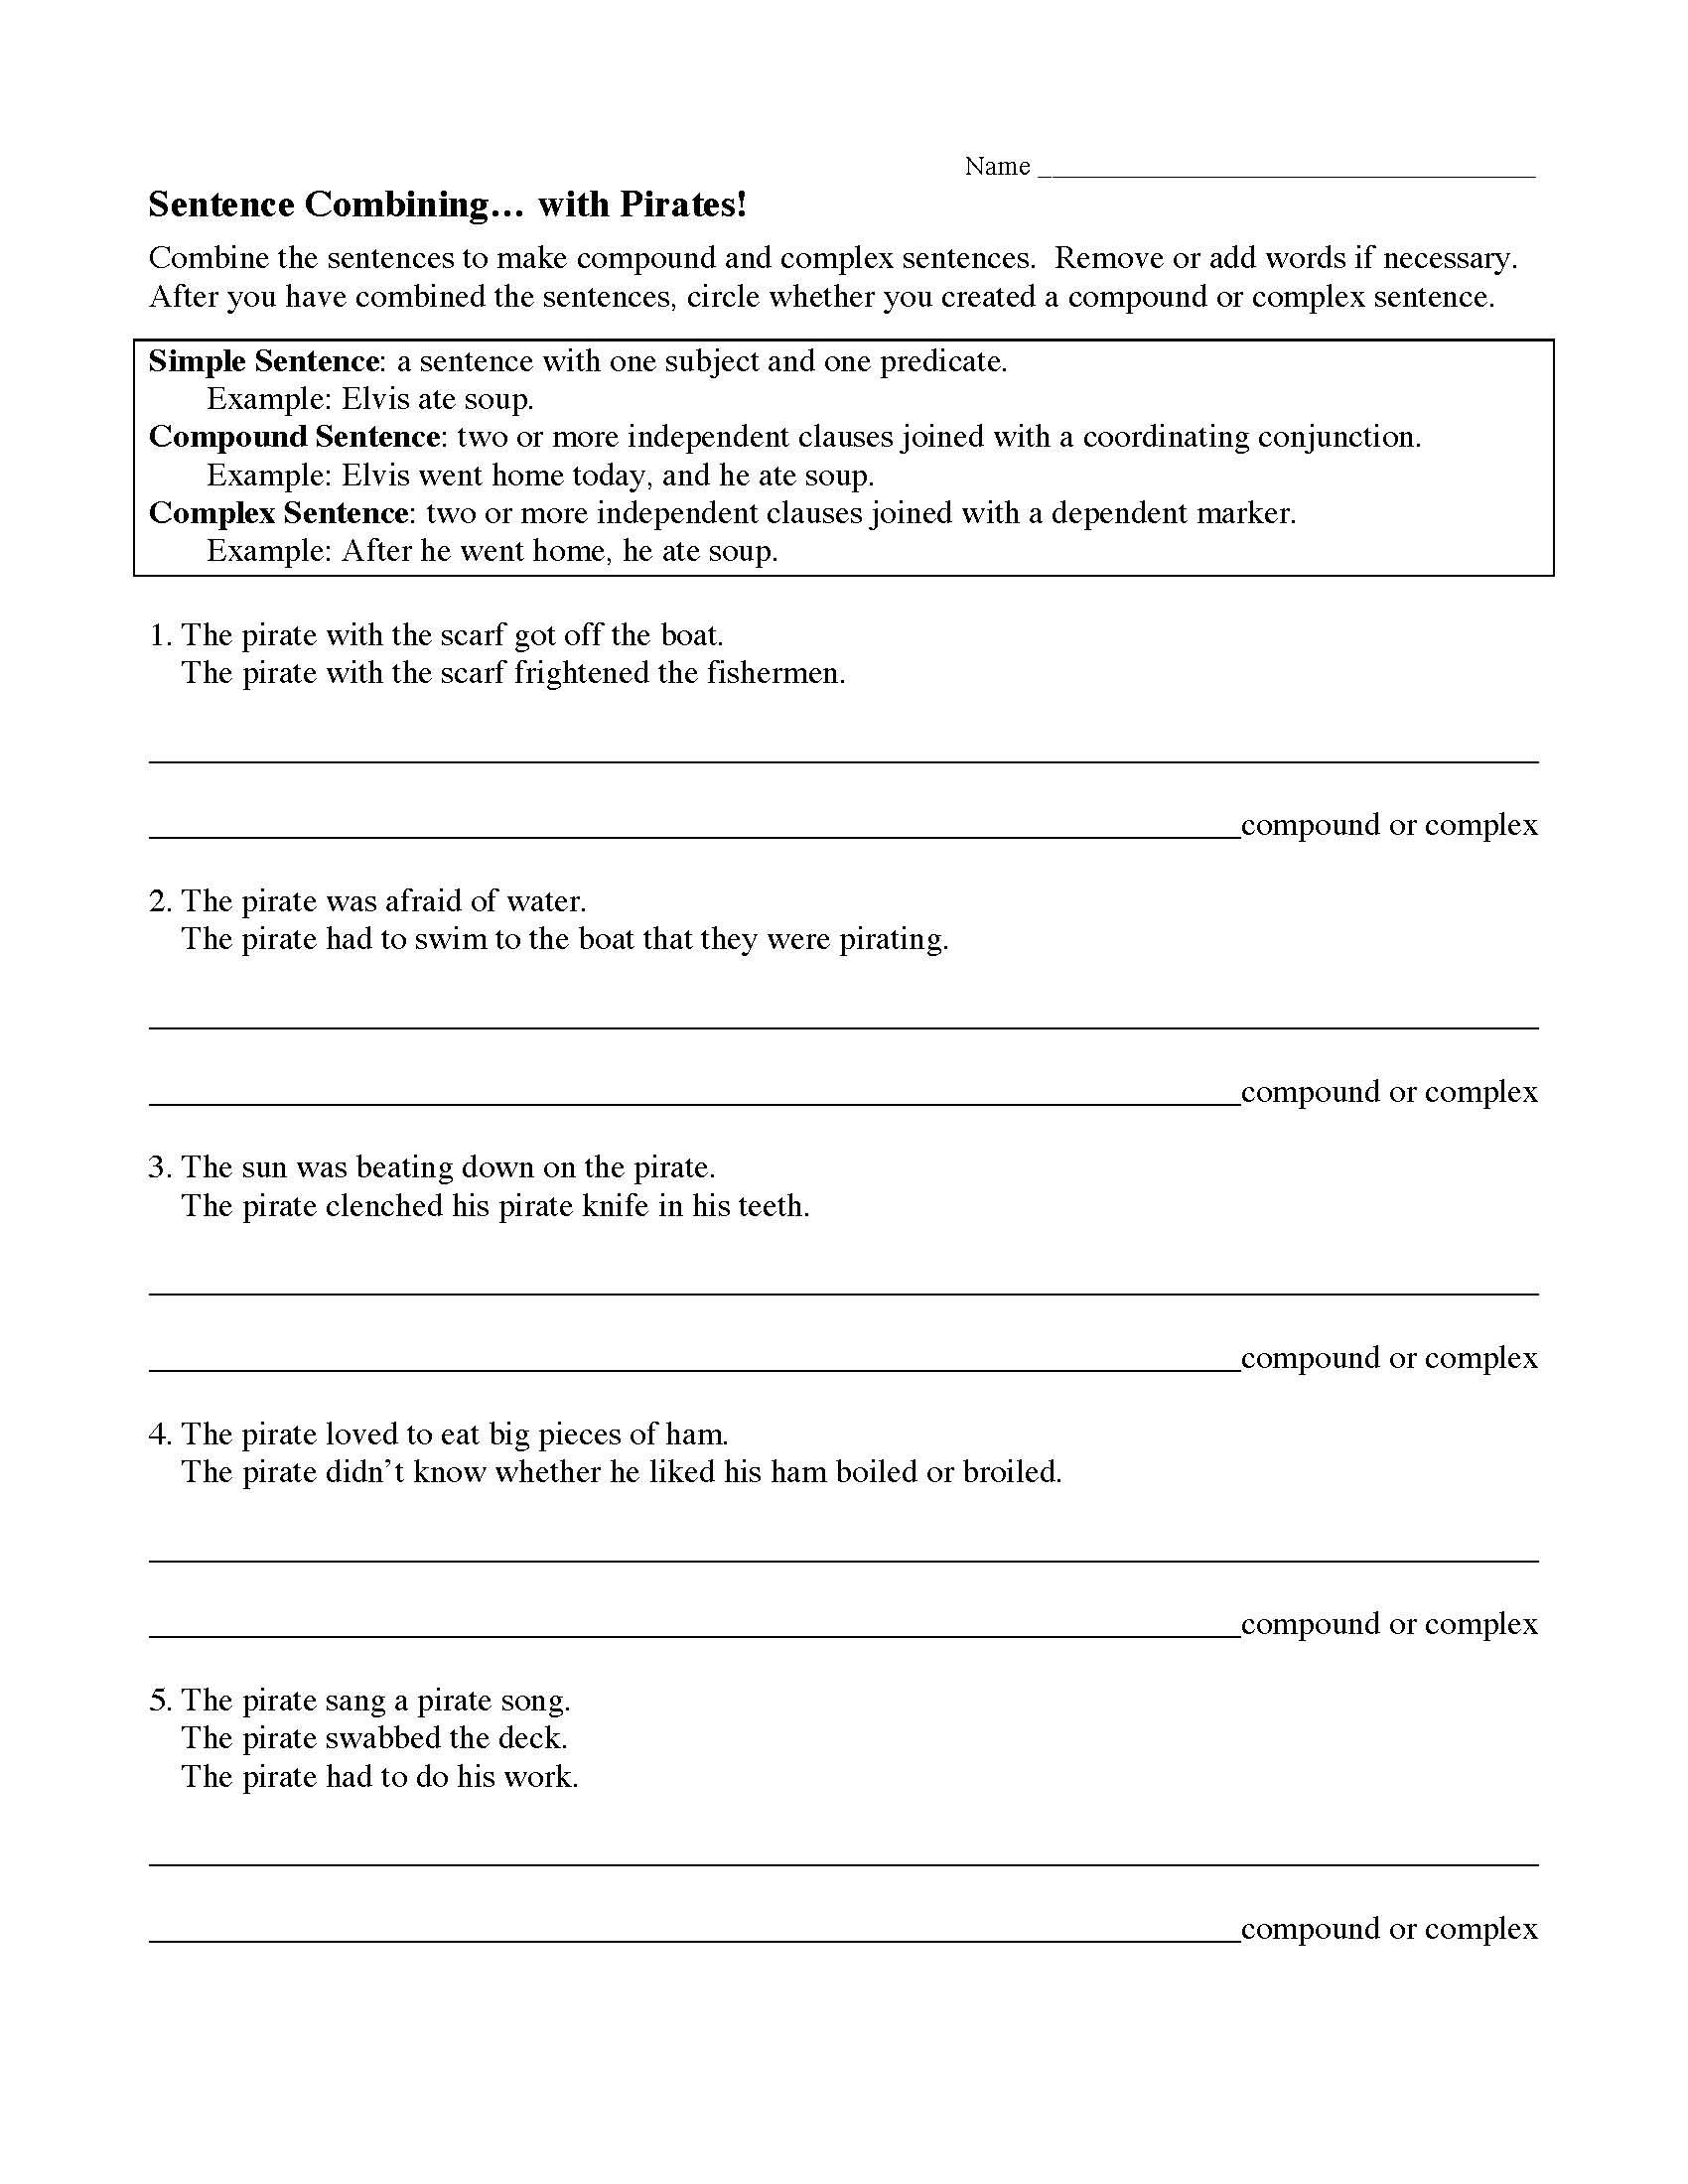 Sentences Combining With Pirates Worksheet